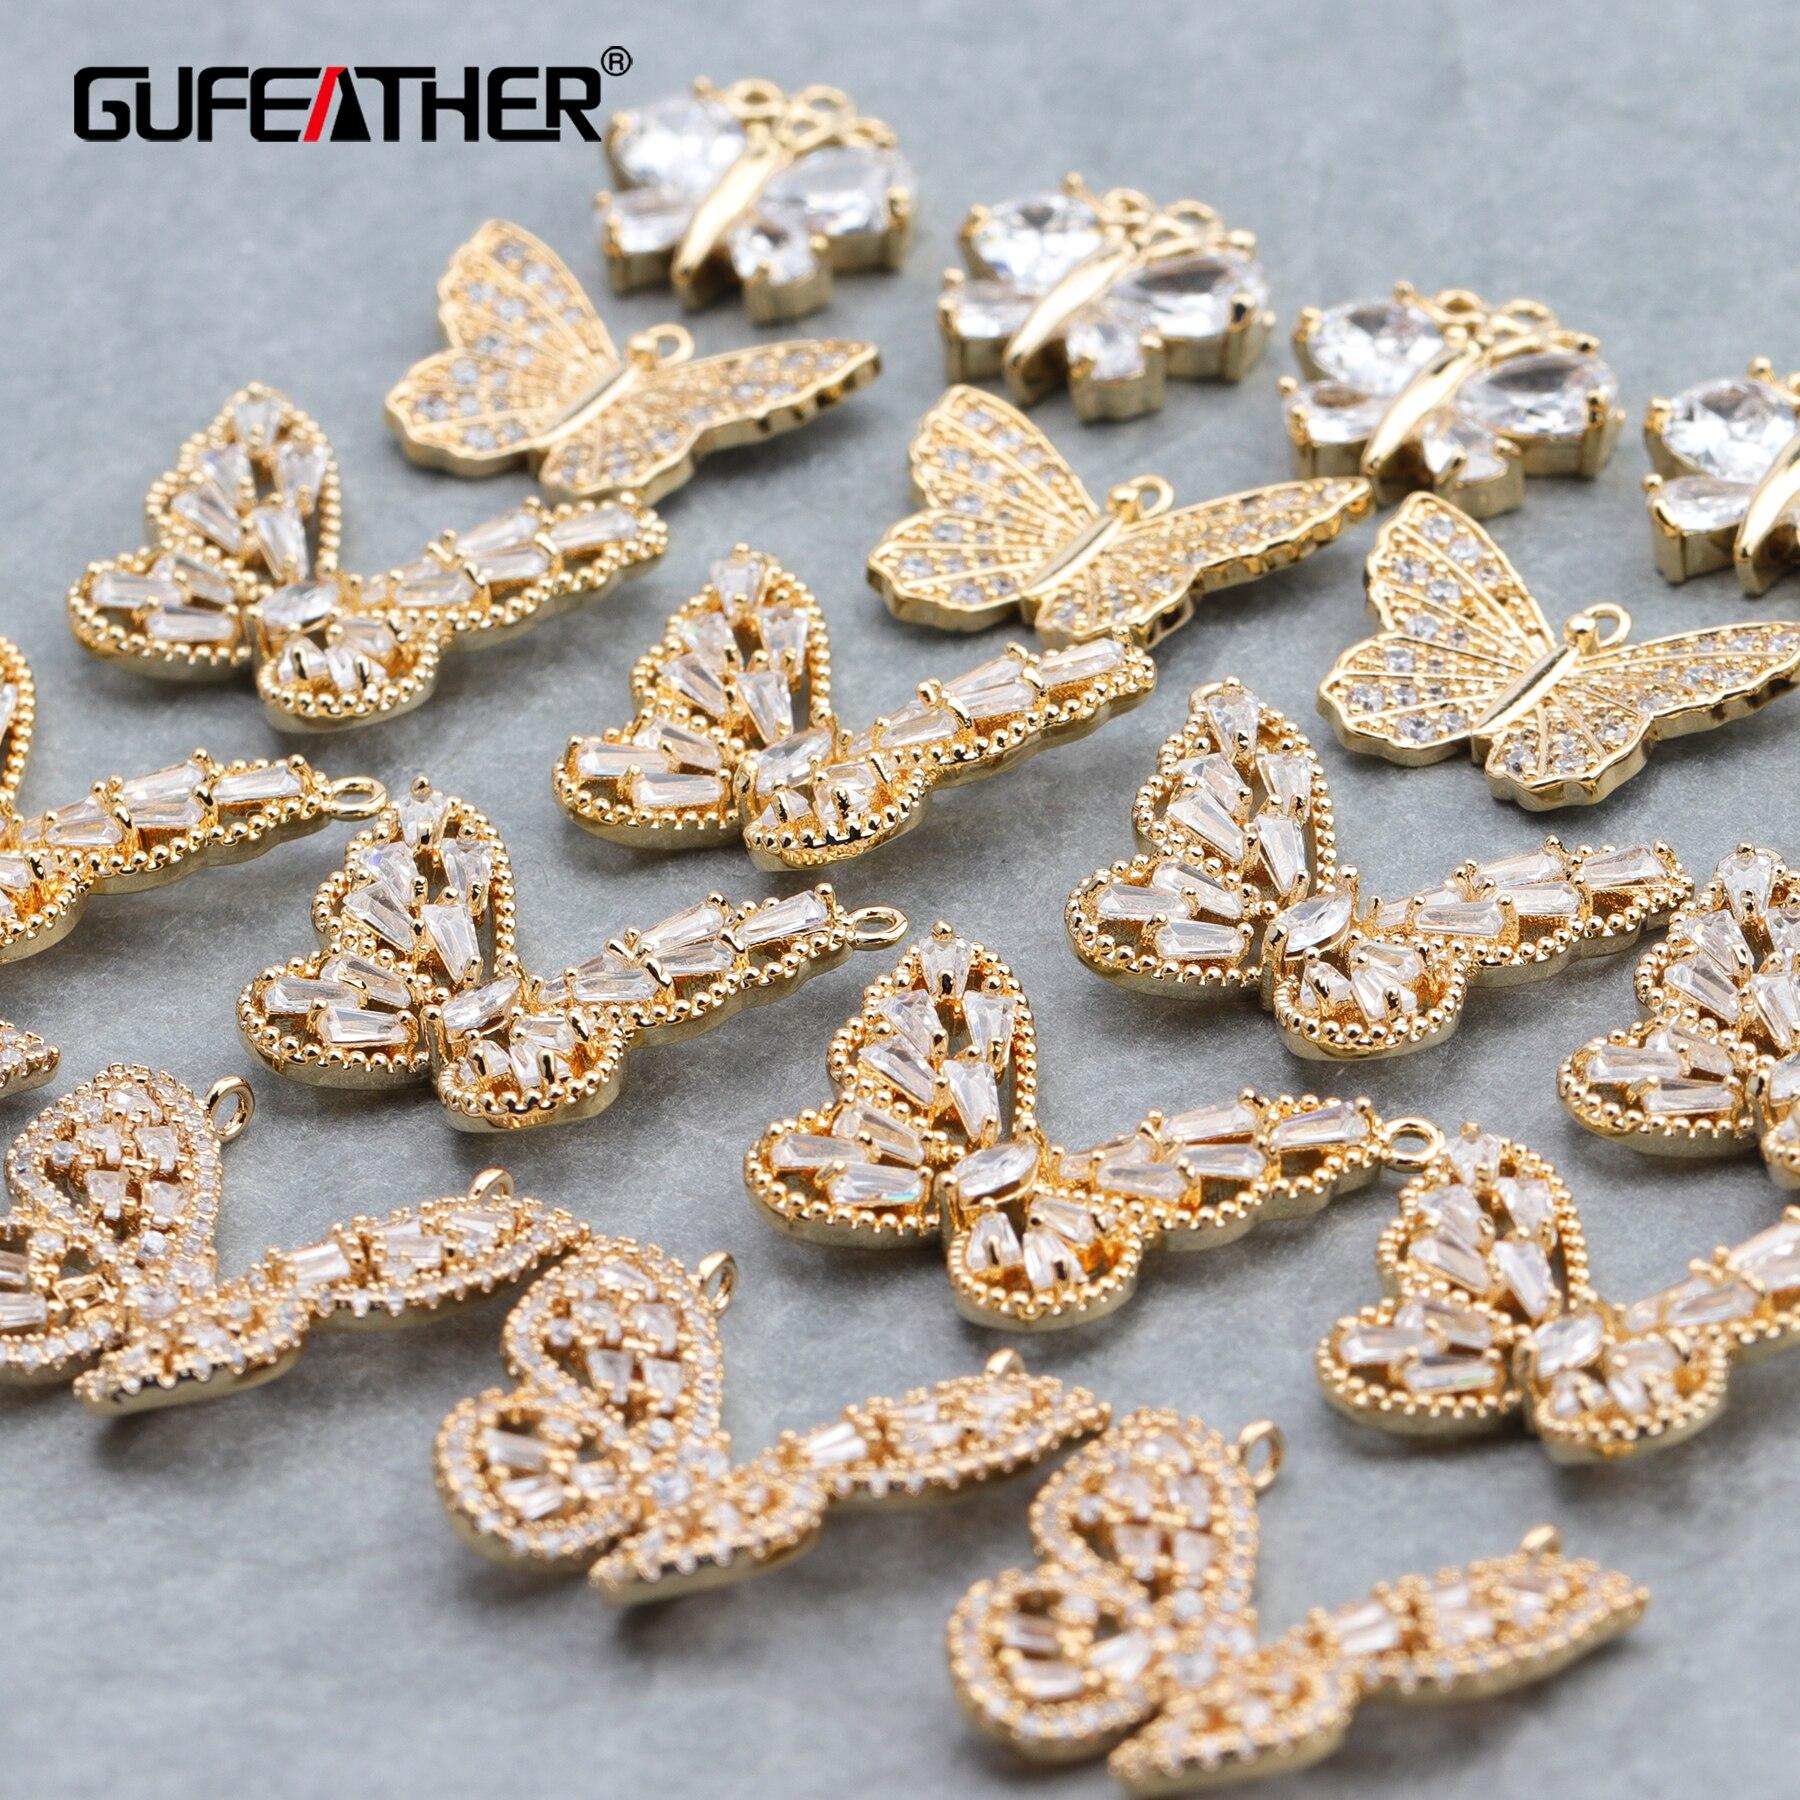 GUFEATHER M665,jewelry Accessories,18k Gold Plated,zircon Pendant,butterfly Shape,handmade,jewelry Making,diy Earrings,10pcs/lot